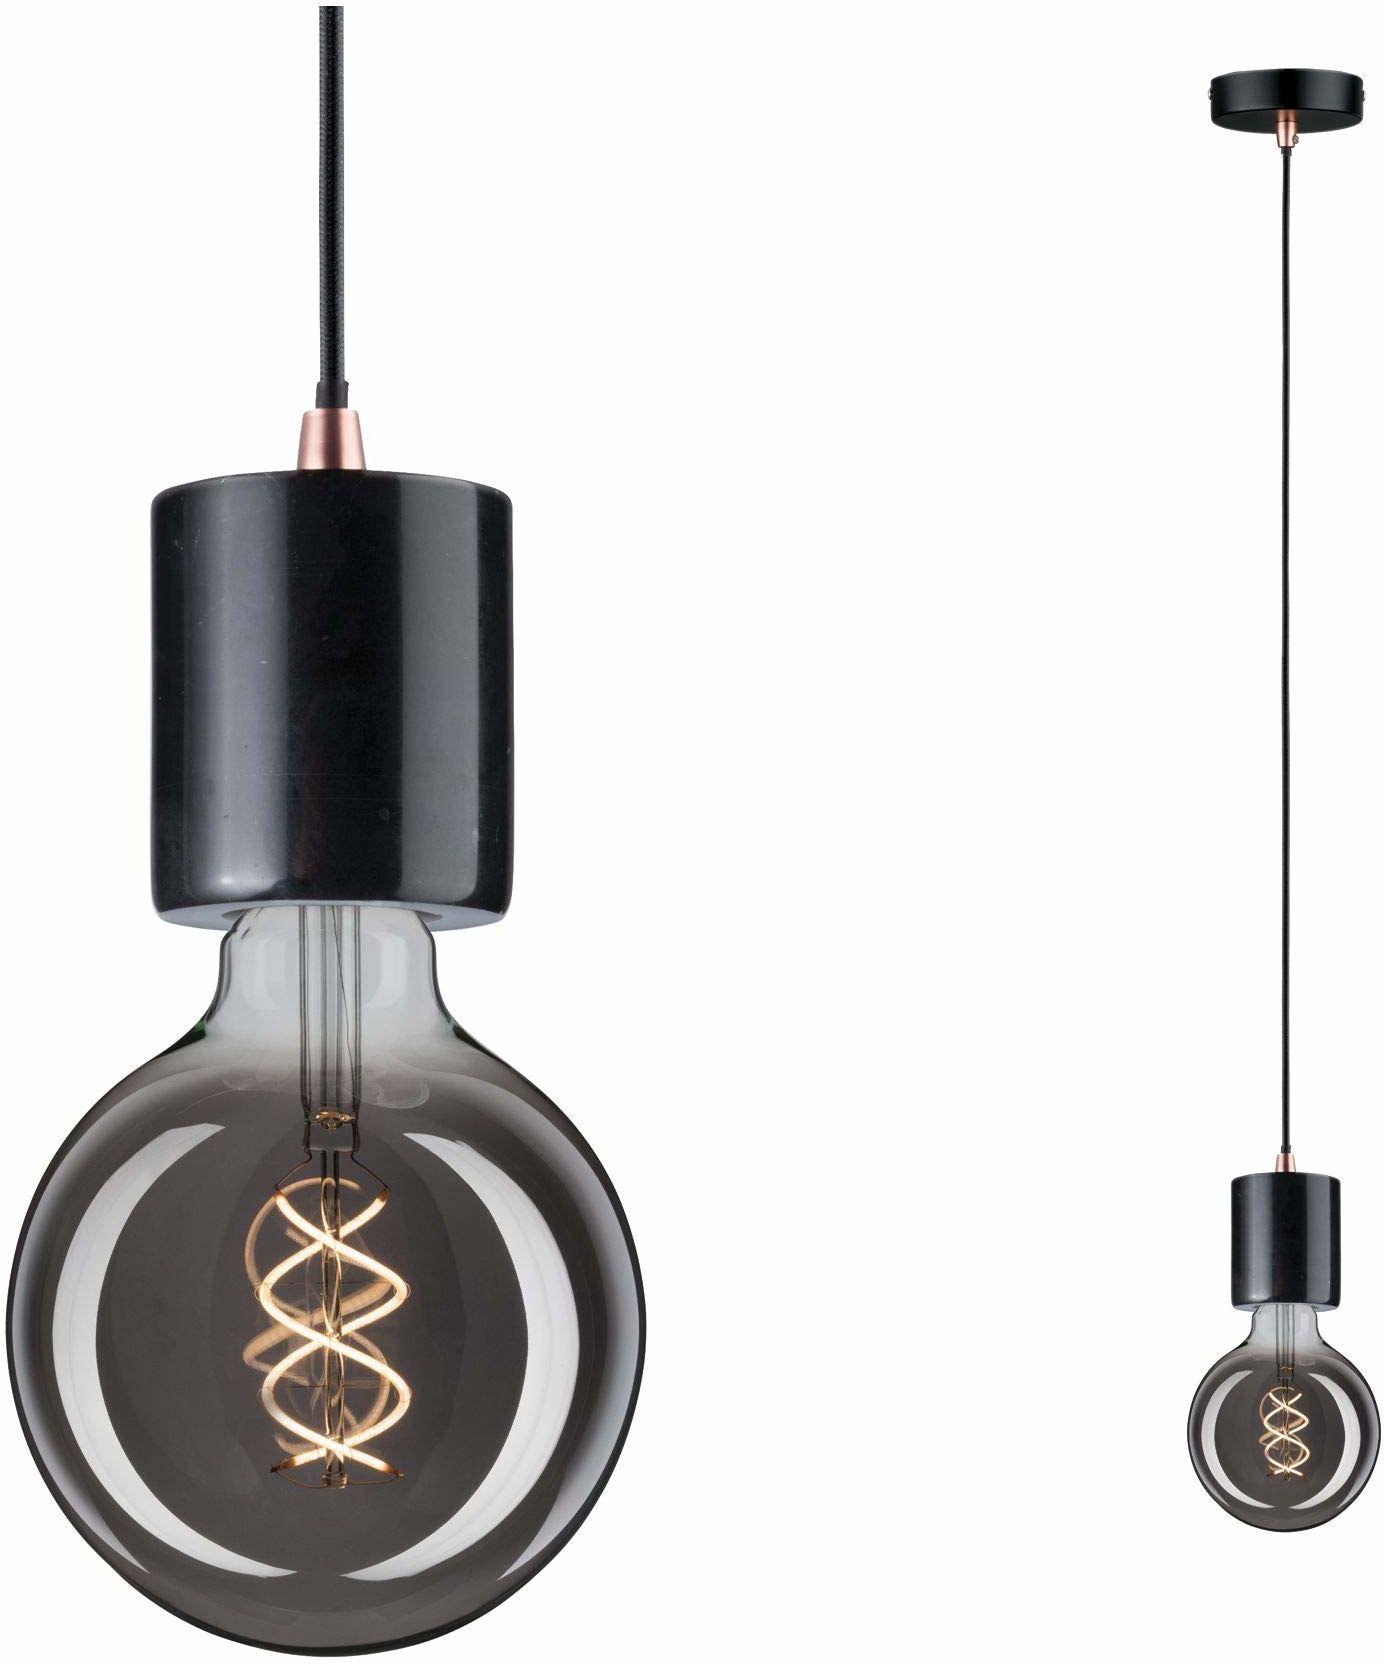 Paulmann 79751 lampa wisząca Neordic Nordin maks. 20 watów lampa wisząca czarna, marmur, miedź matowa lampa wisząca marmurowa lampa wisząca E27